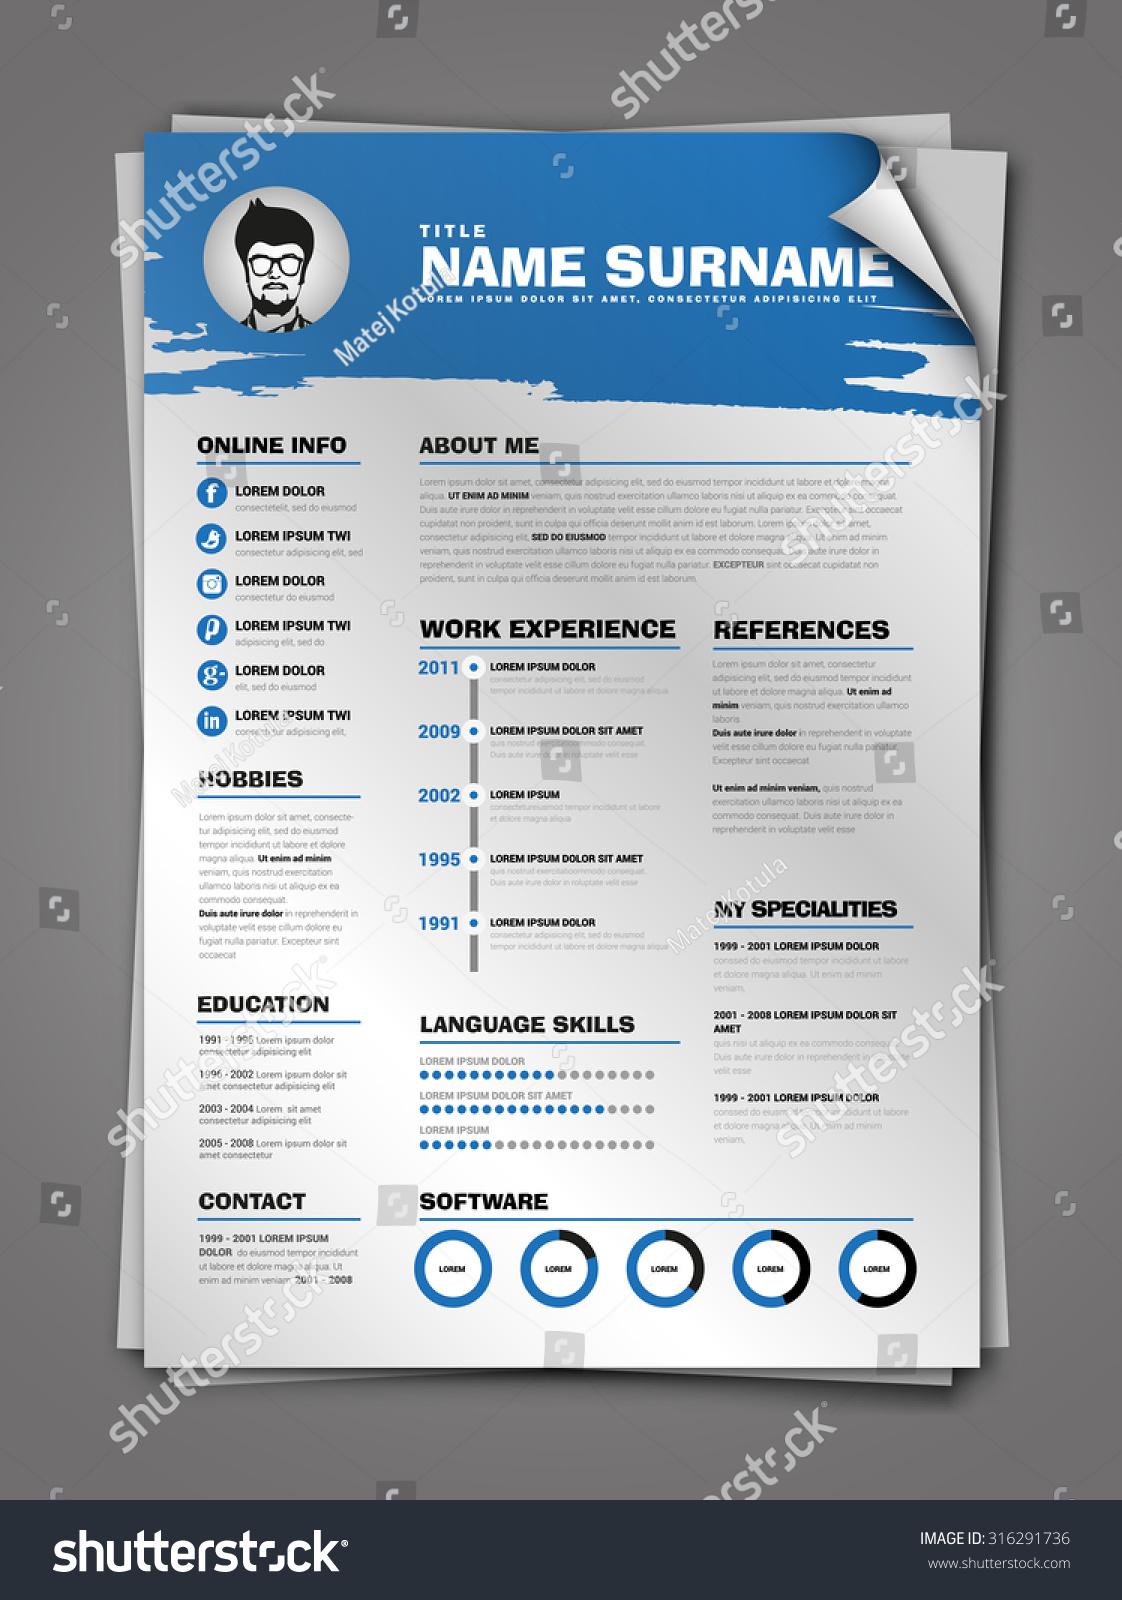 resume for cvs resume format download pdf resume paper template best paper to print resume on